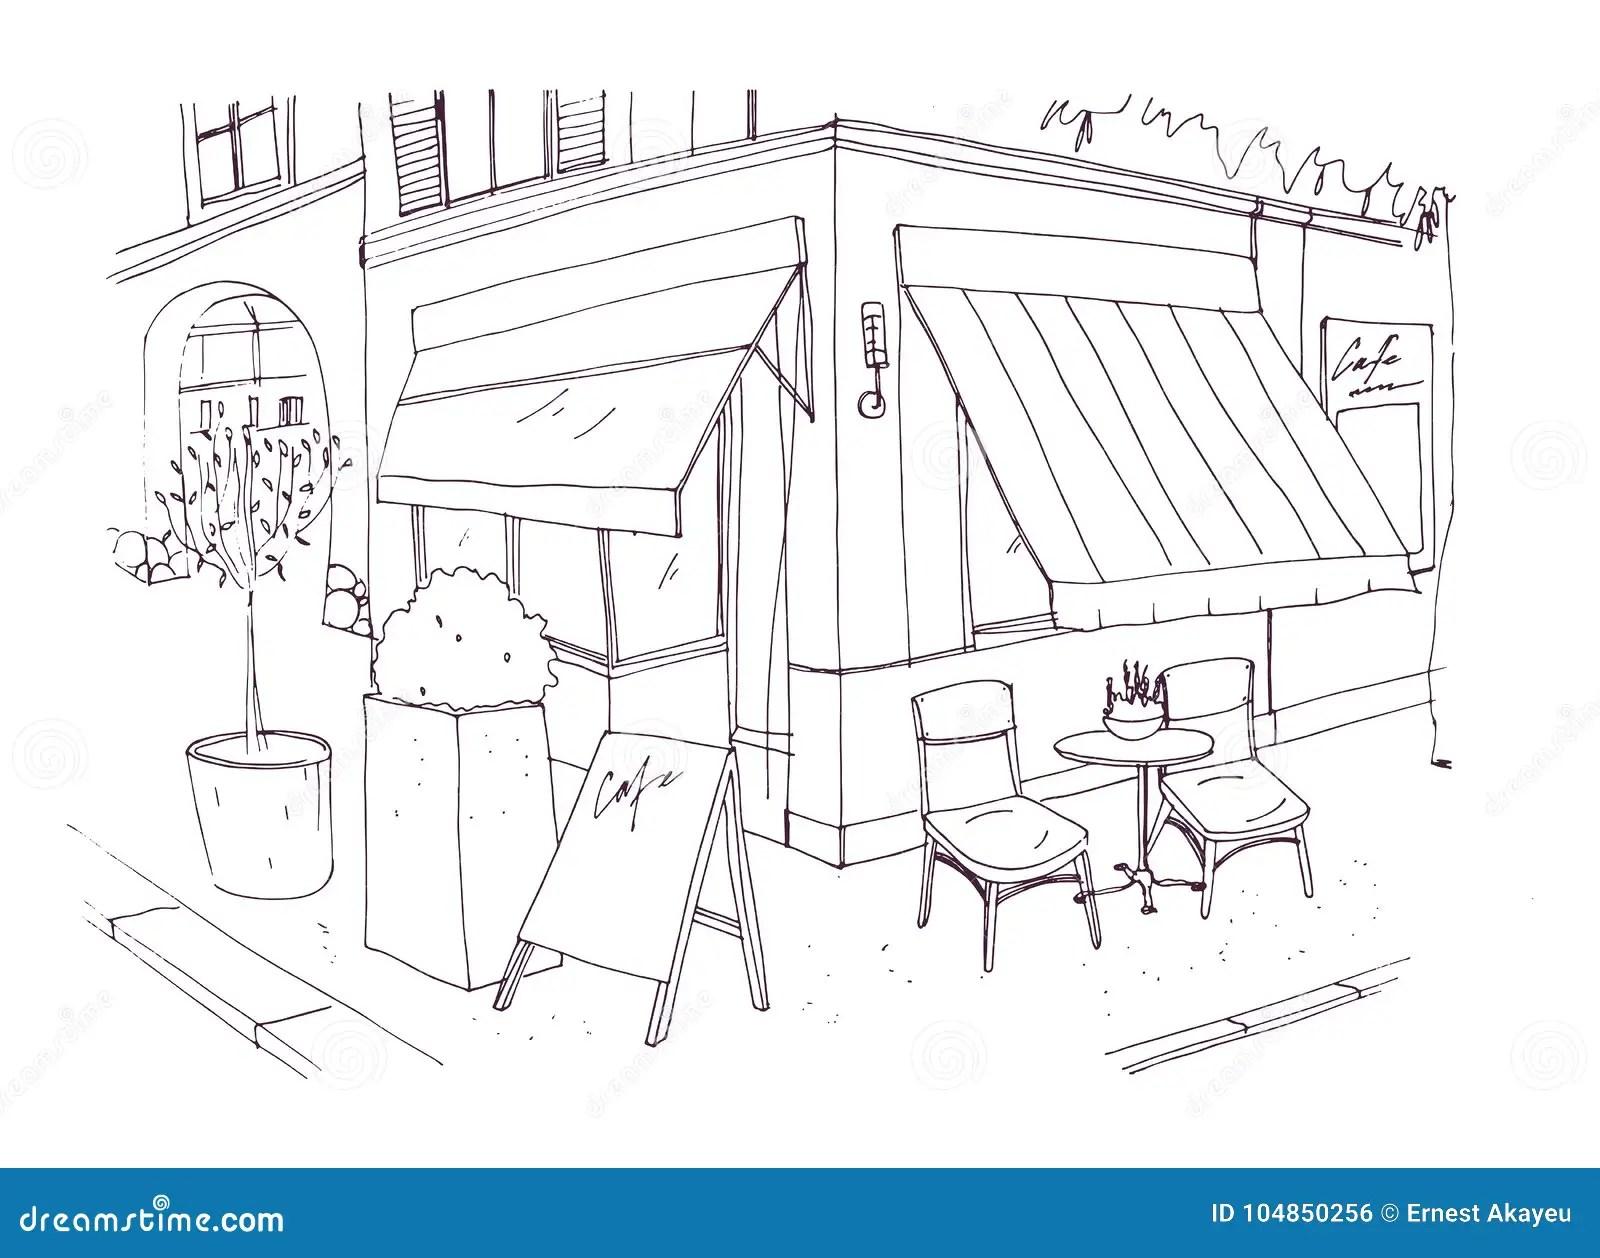 Freehand Drawing Of European Sidewalk Cafe Or Restaurant